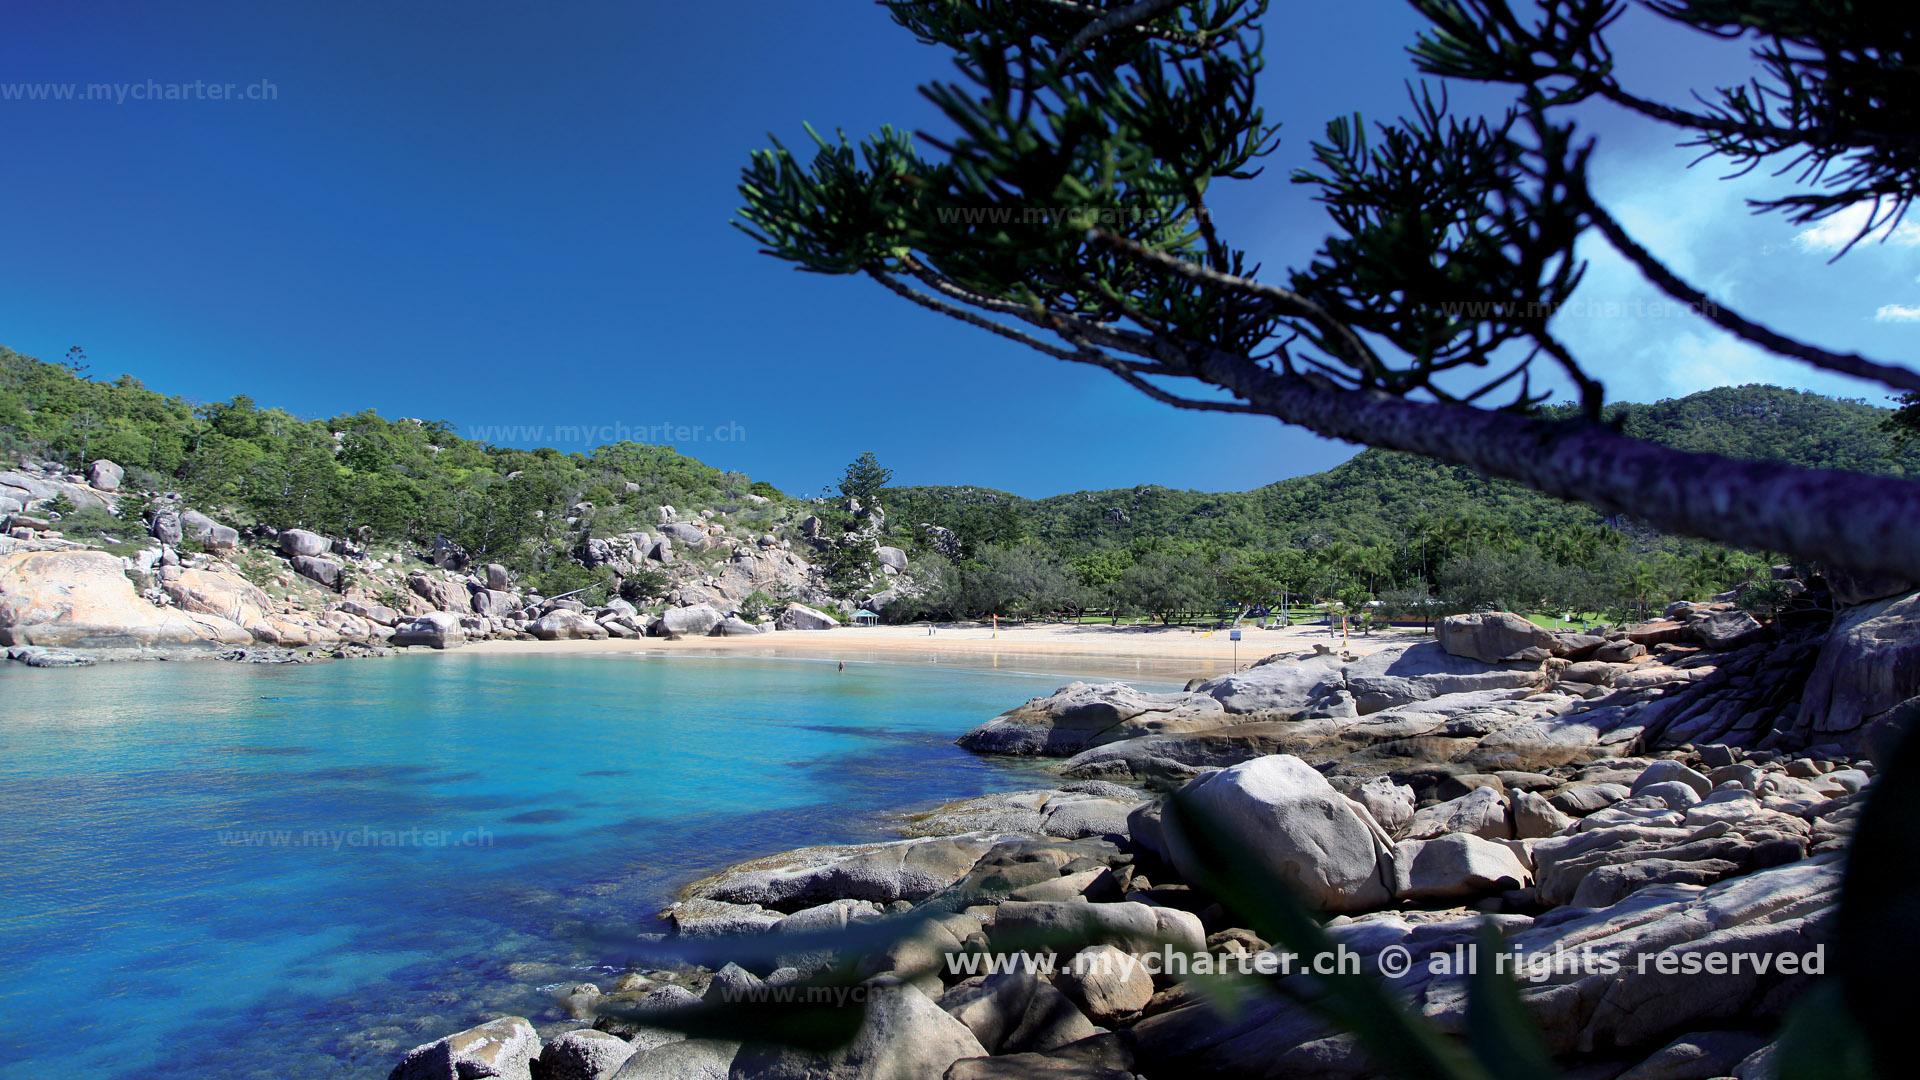 Yachtcharter Südesee - Australien - Magnetic Island